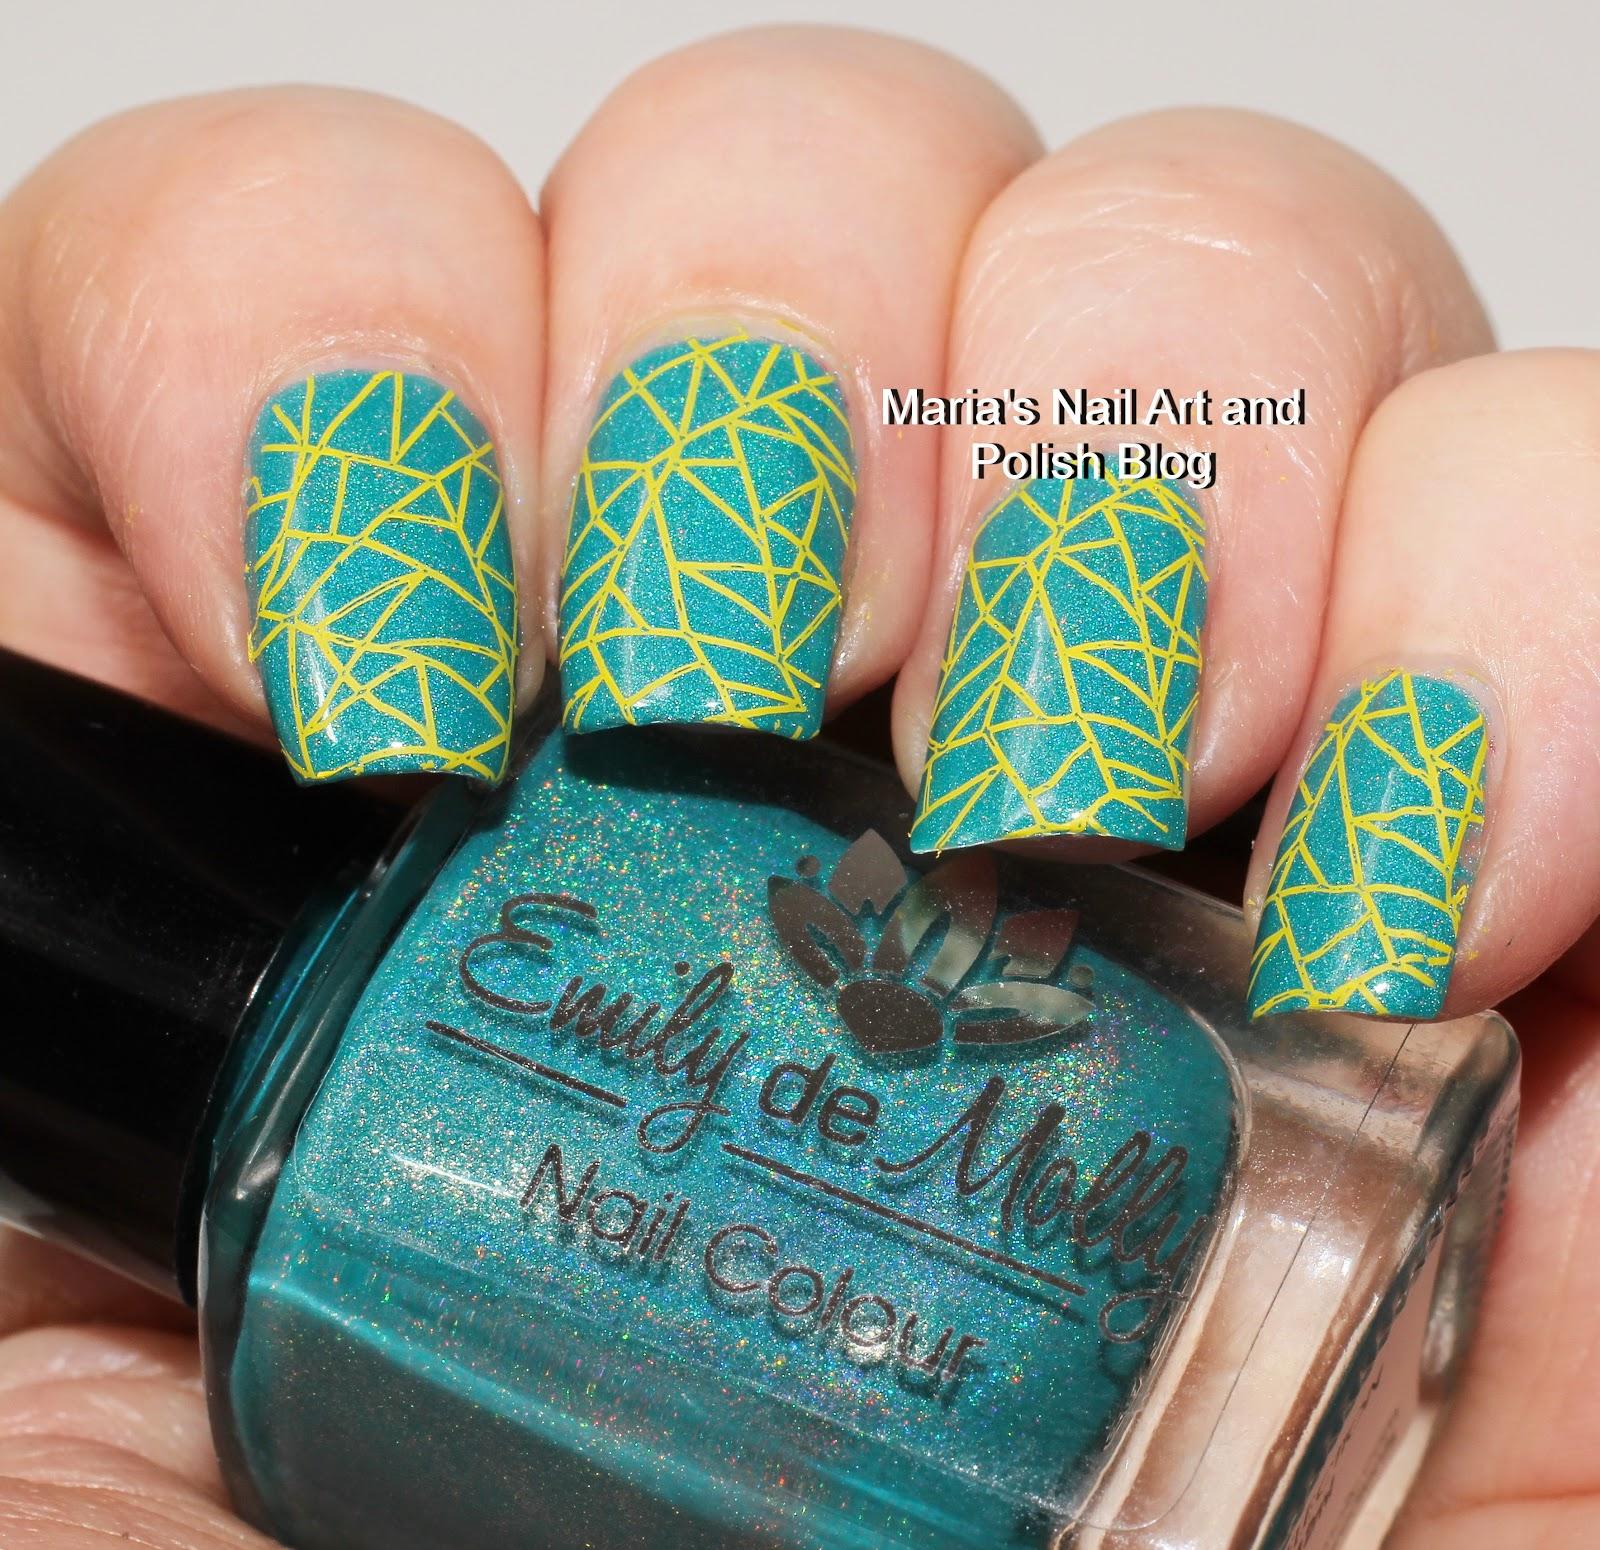 Marias Nail Art and Polish Blog: My stamping journey - part 24